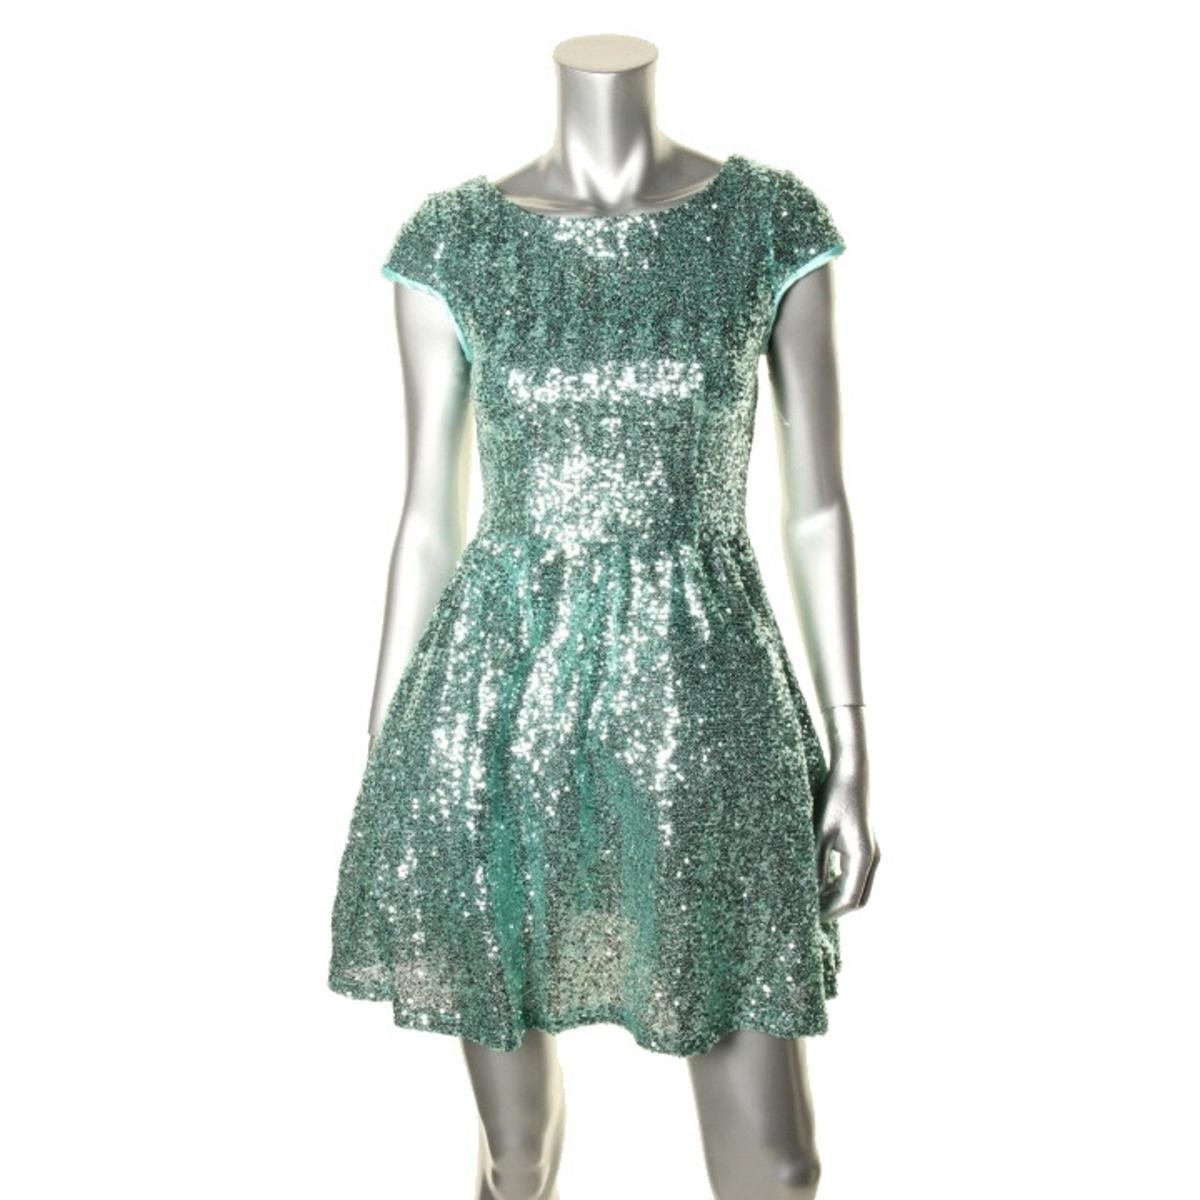 8f1ecb6f488 Semi Formal Dresses For Junior